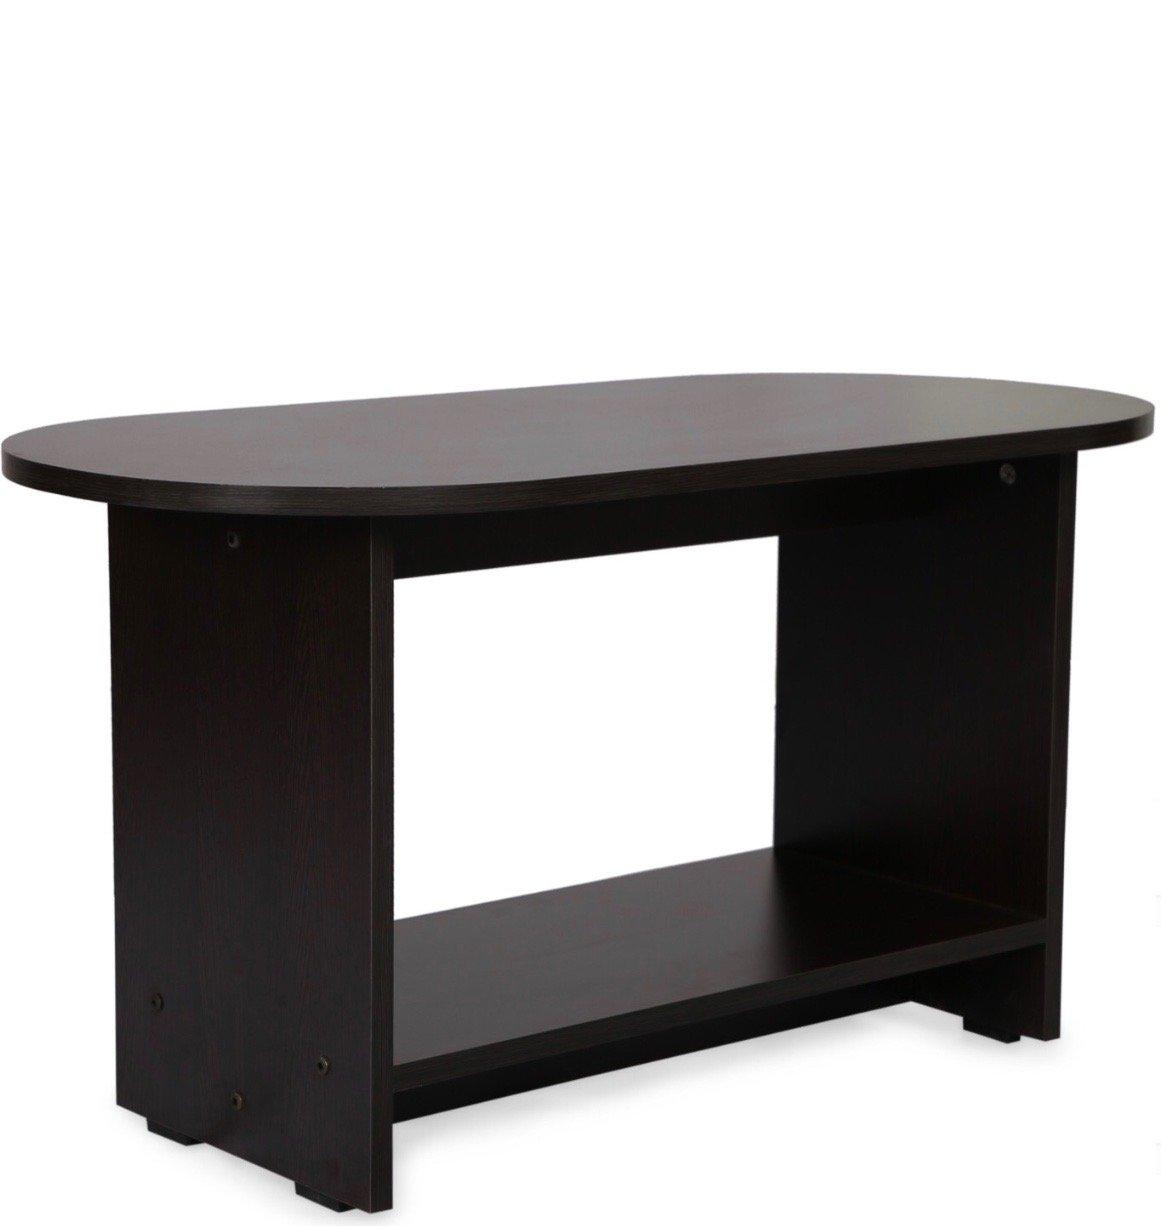 Valtos Monaco Engineerd Wood Coffee Table (Matte Finish, Wenge)